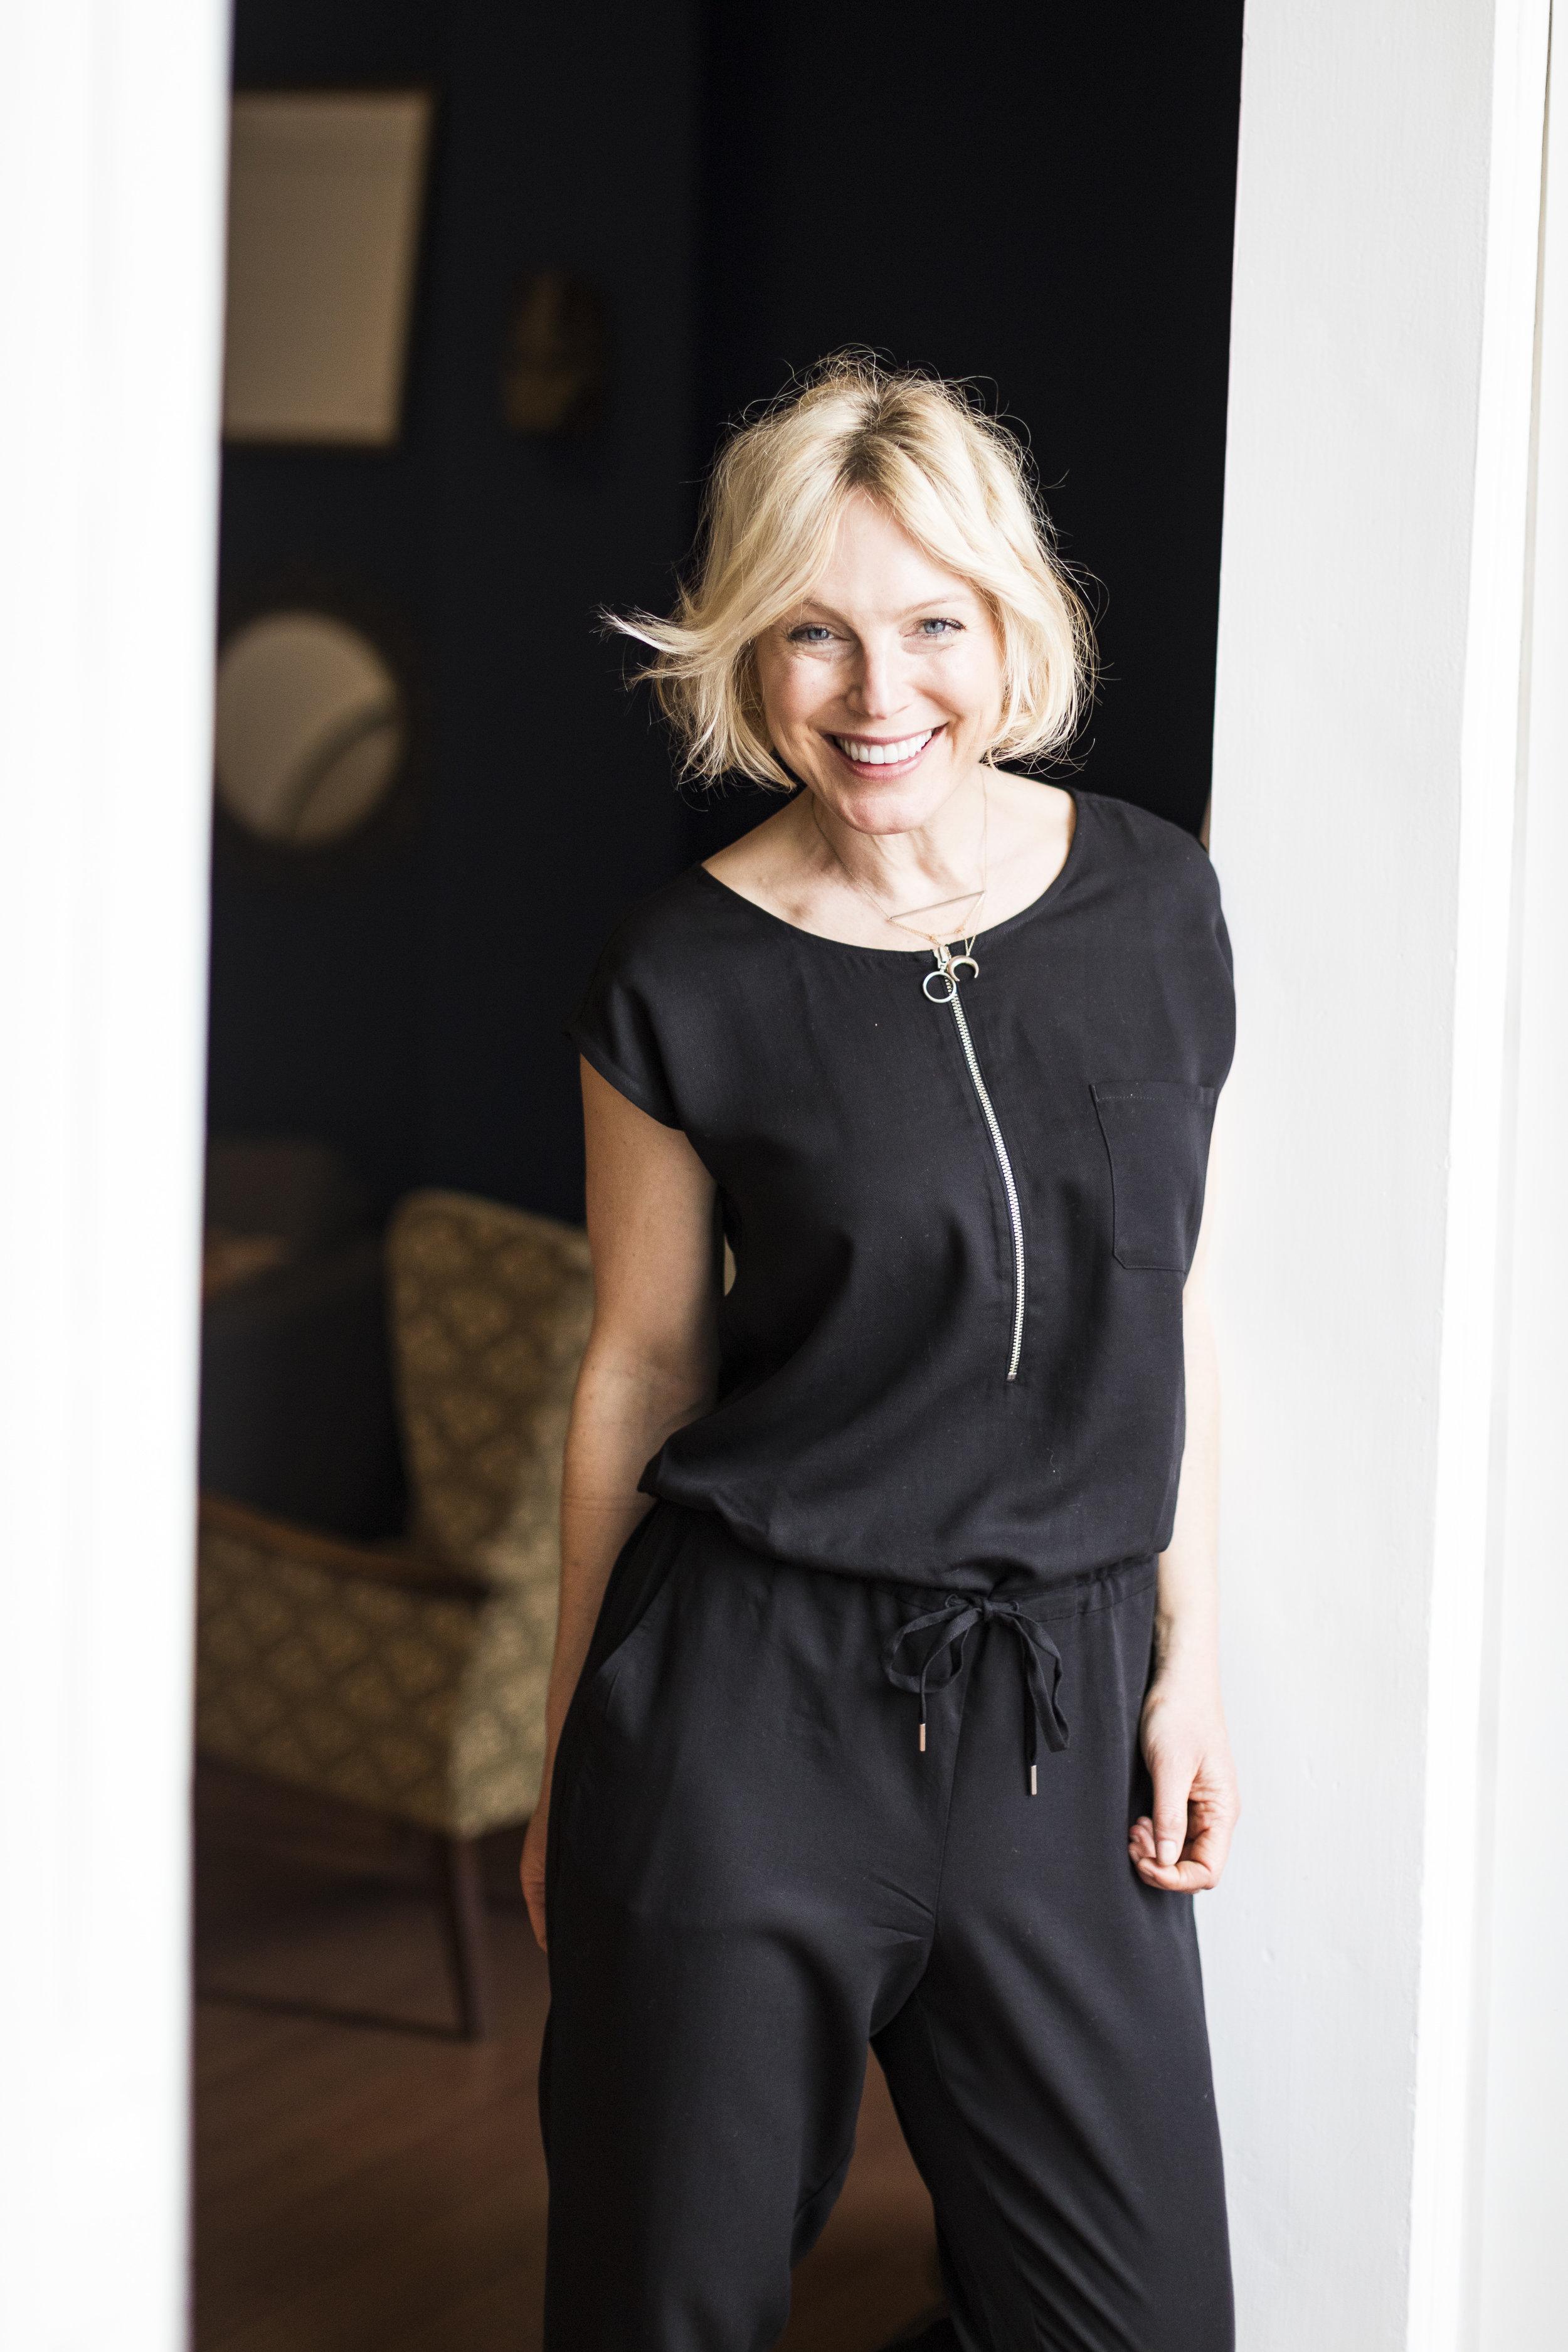 Liz wears the  Gia Jumpsuit